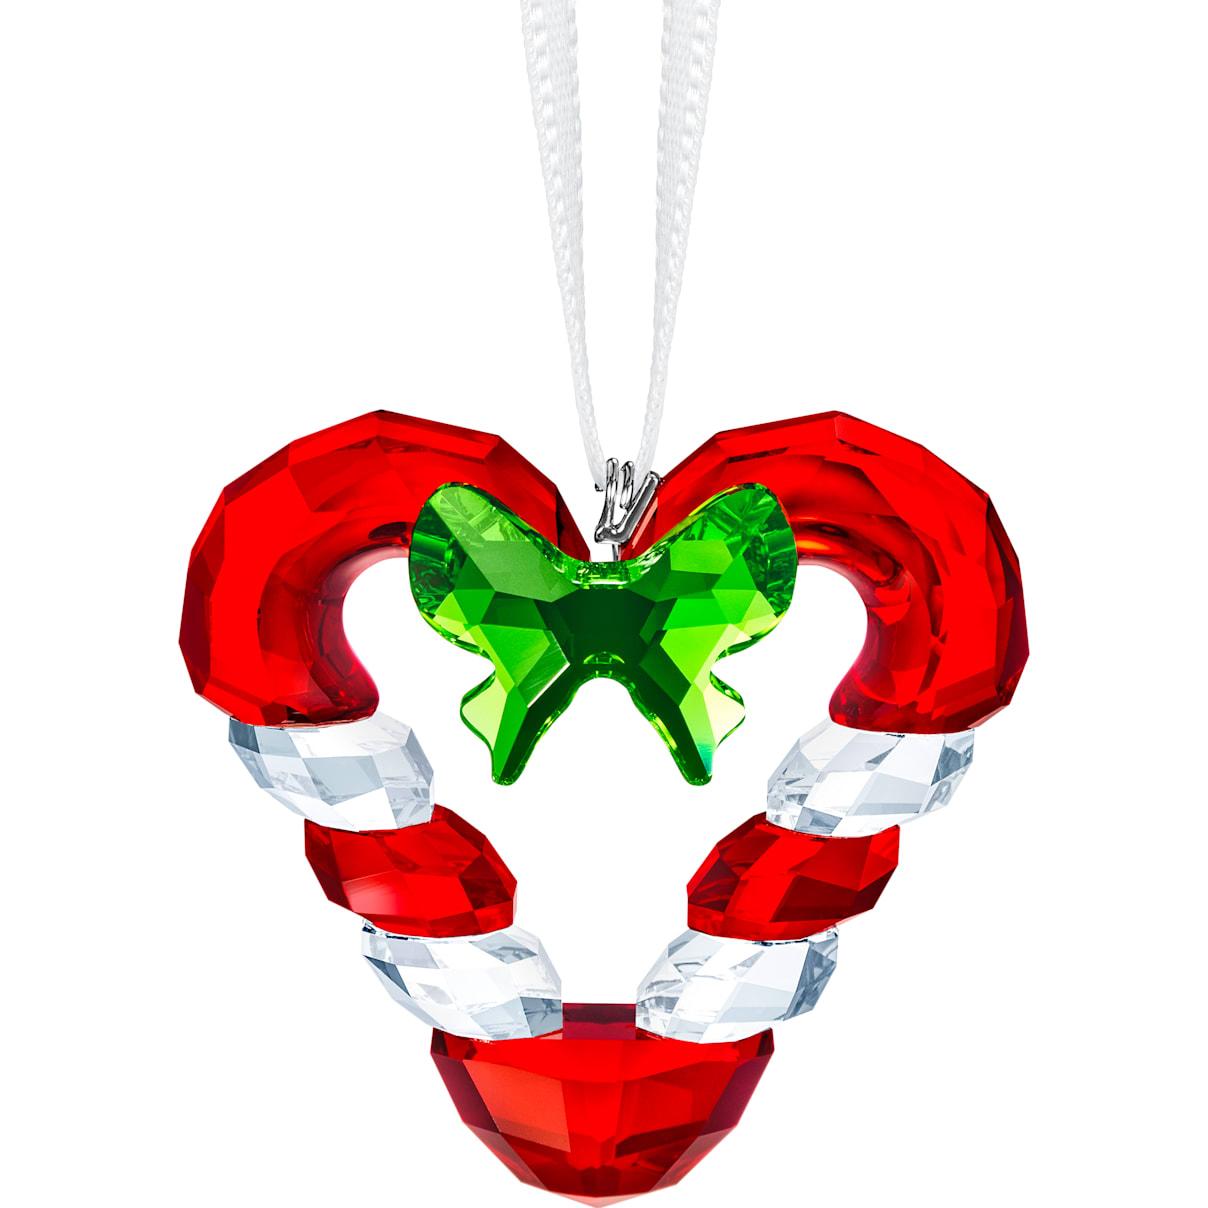 Swarovski Candy Cane Heart Ornament